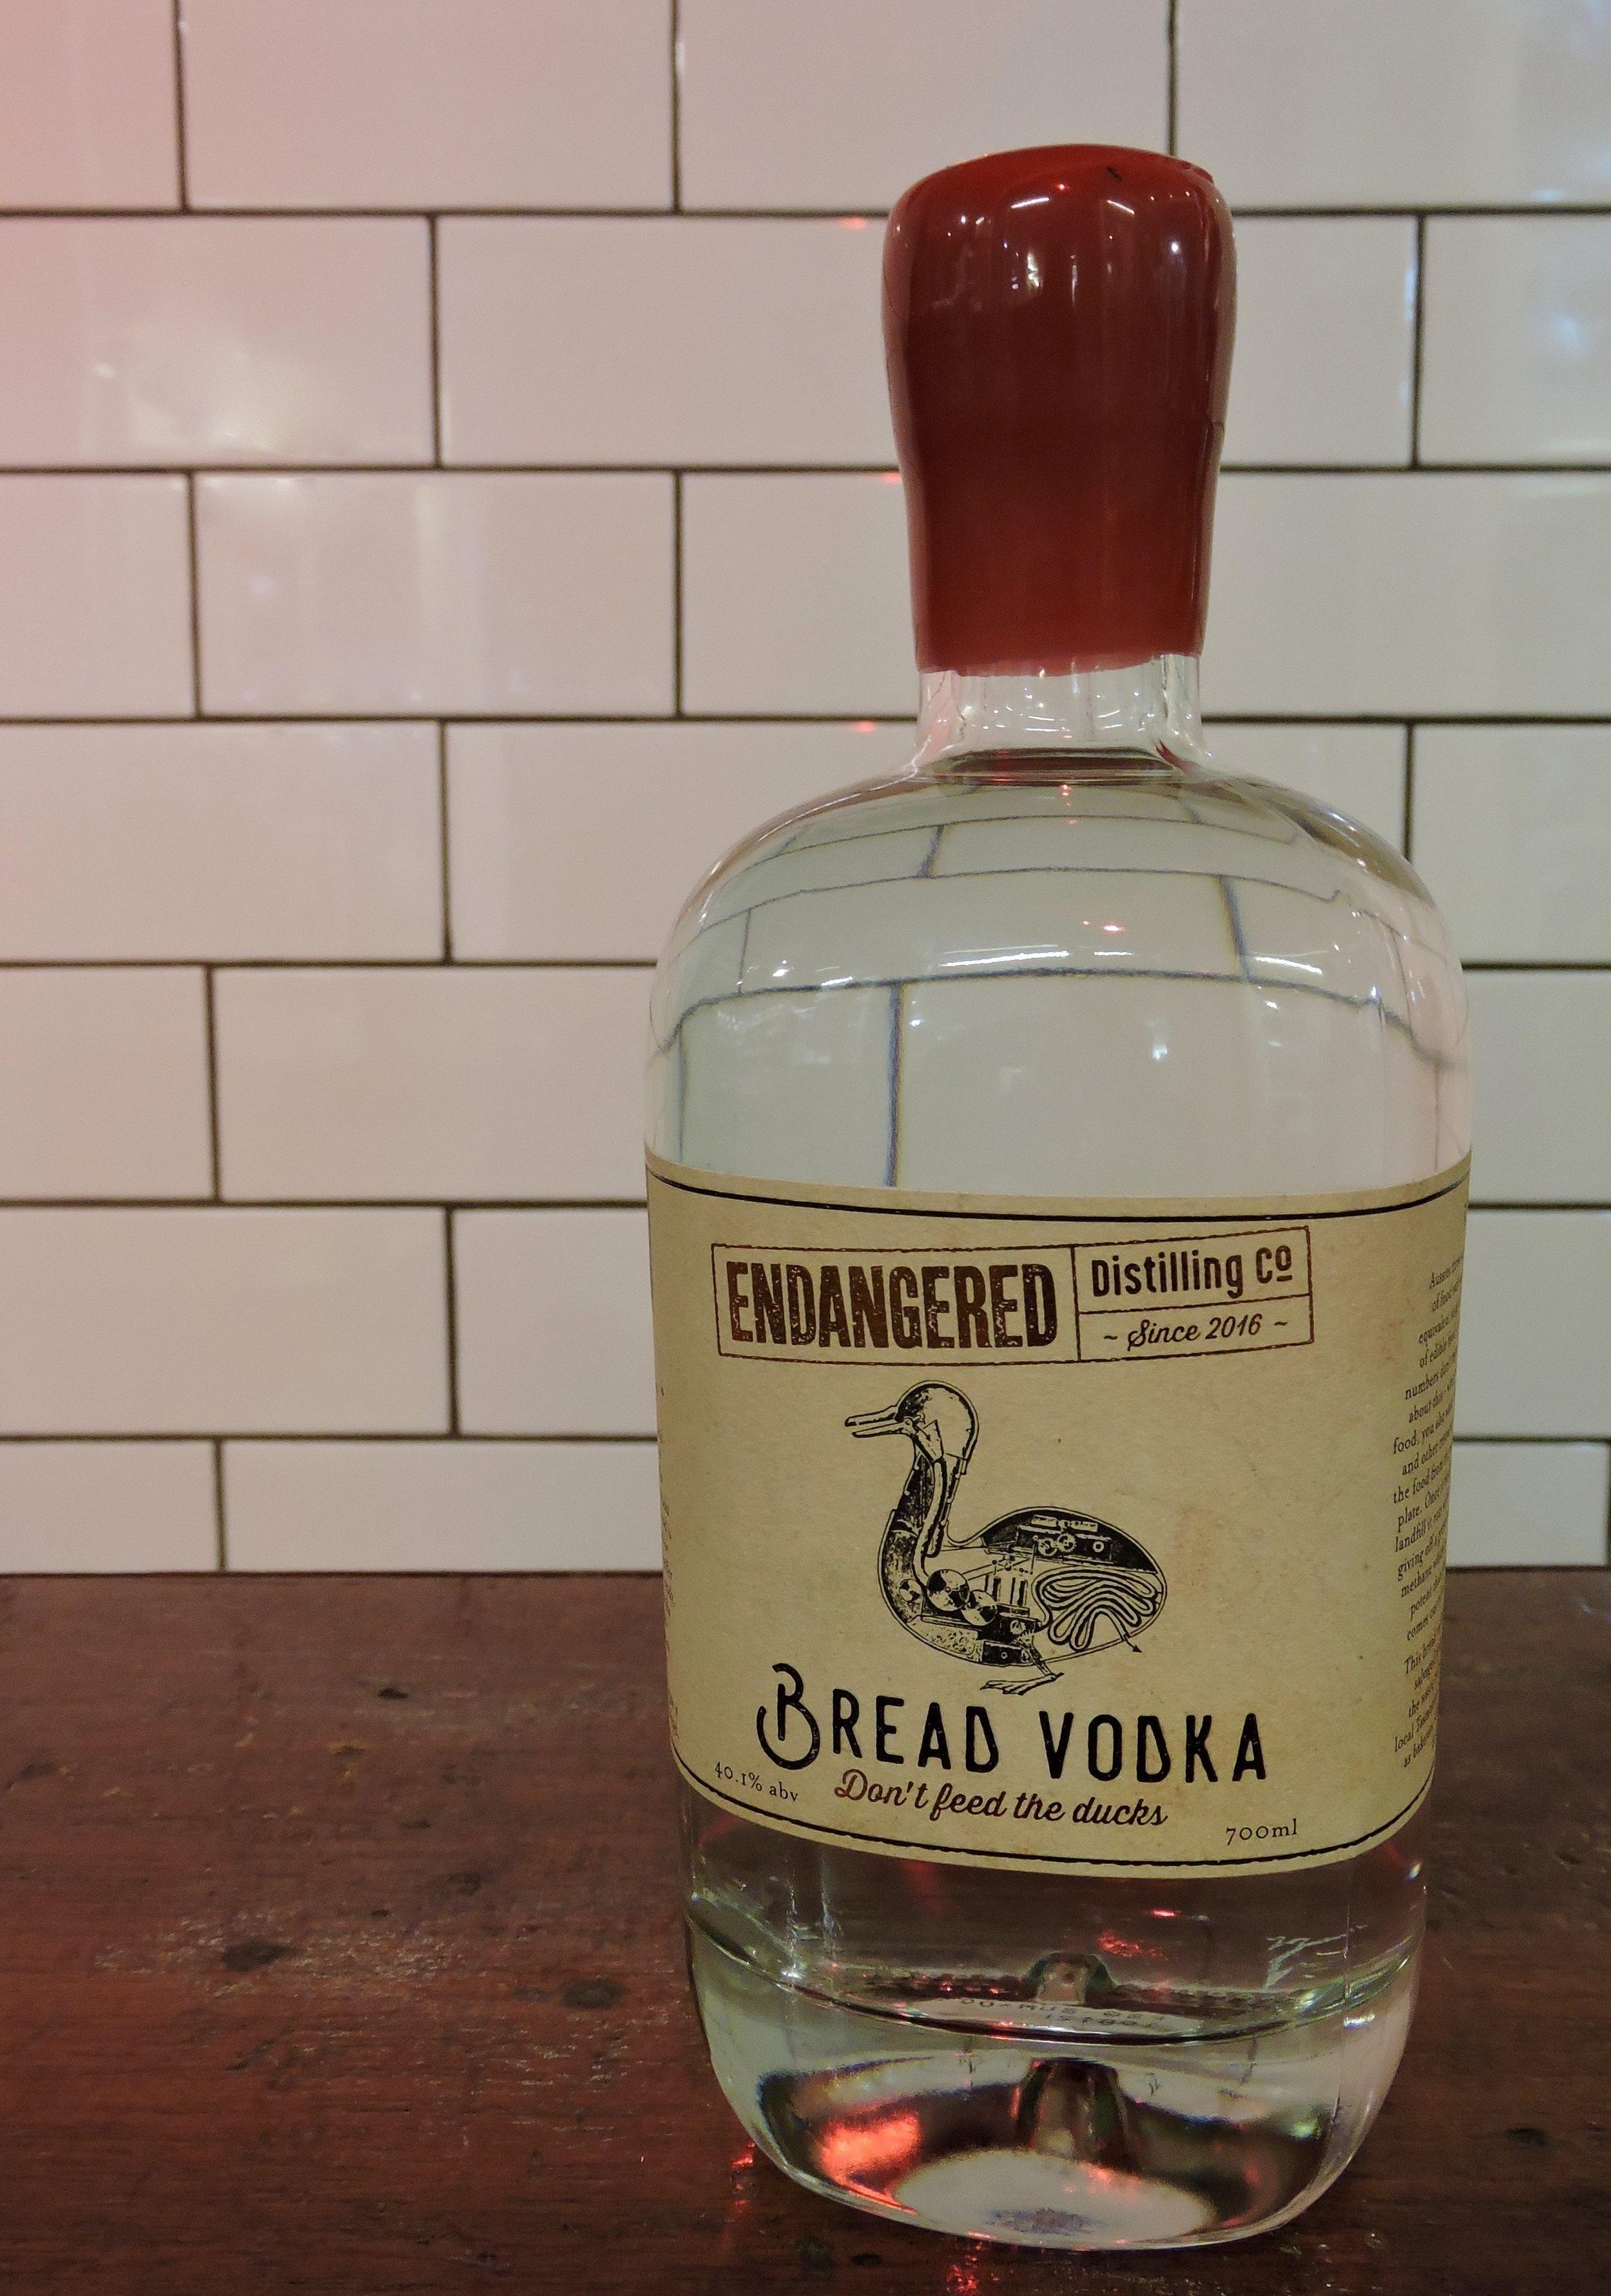 Don'd Feed the Ducks Bread Vodka — Endangered Distilling Co.